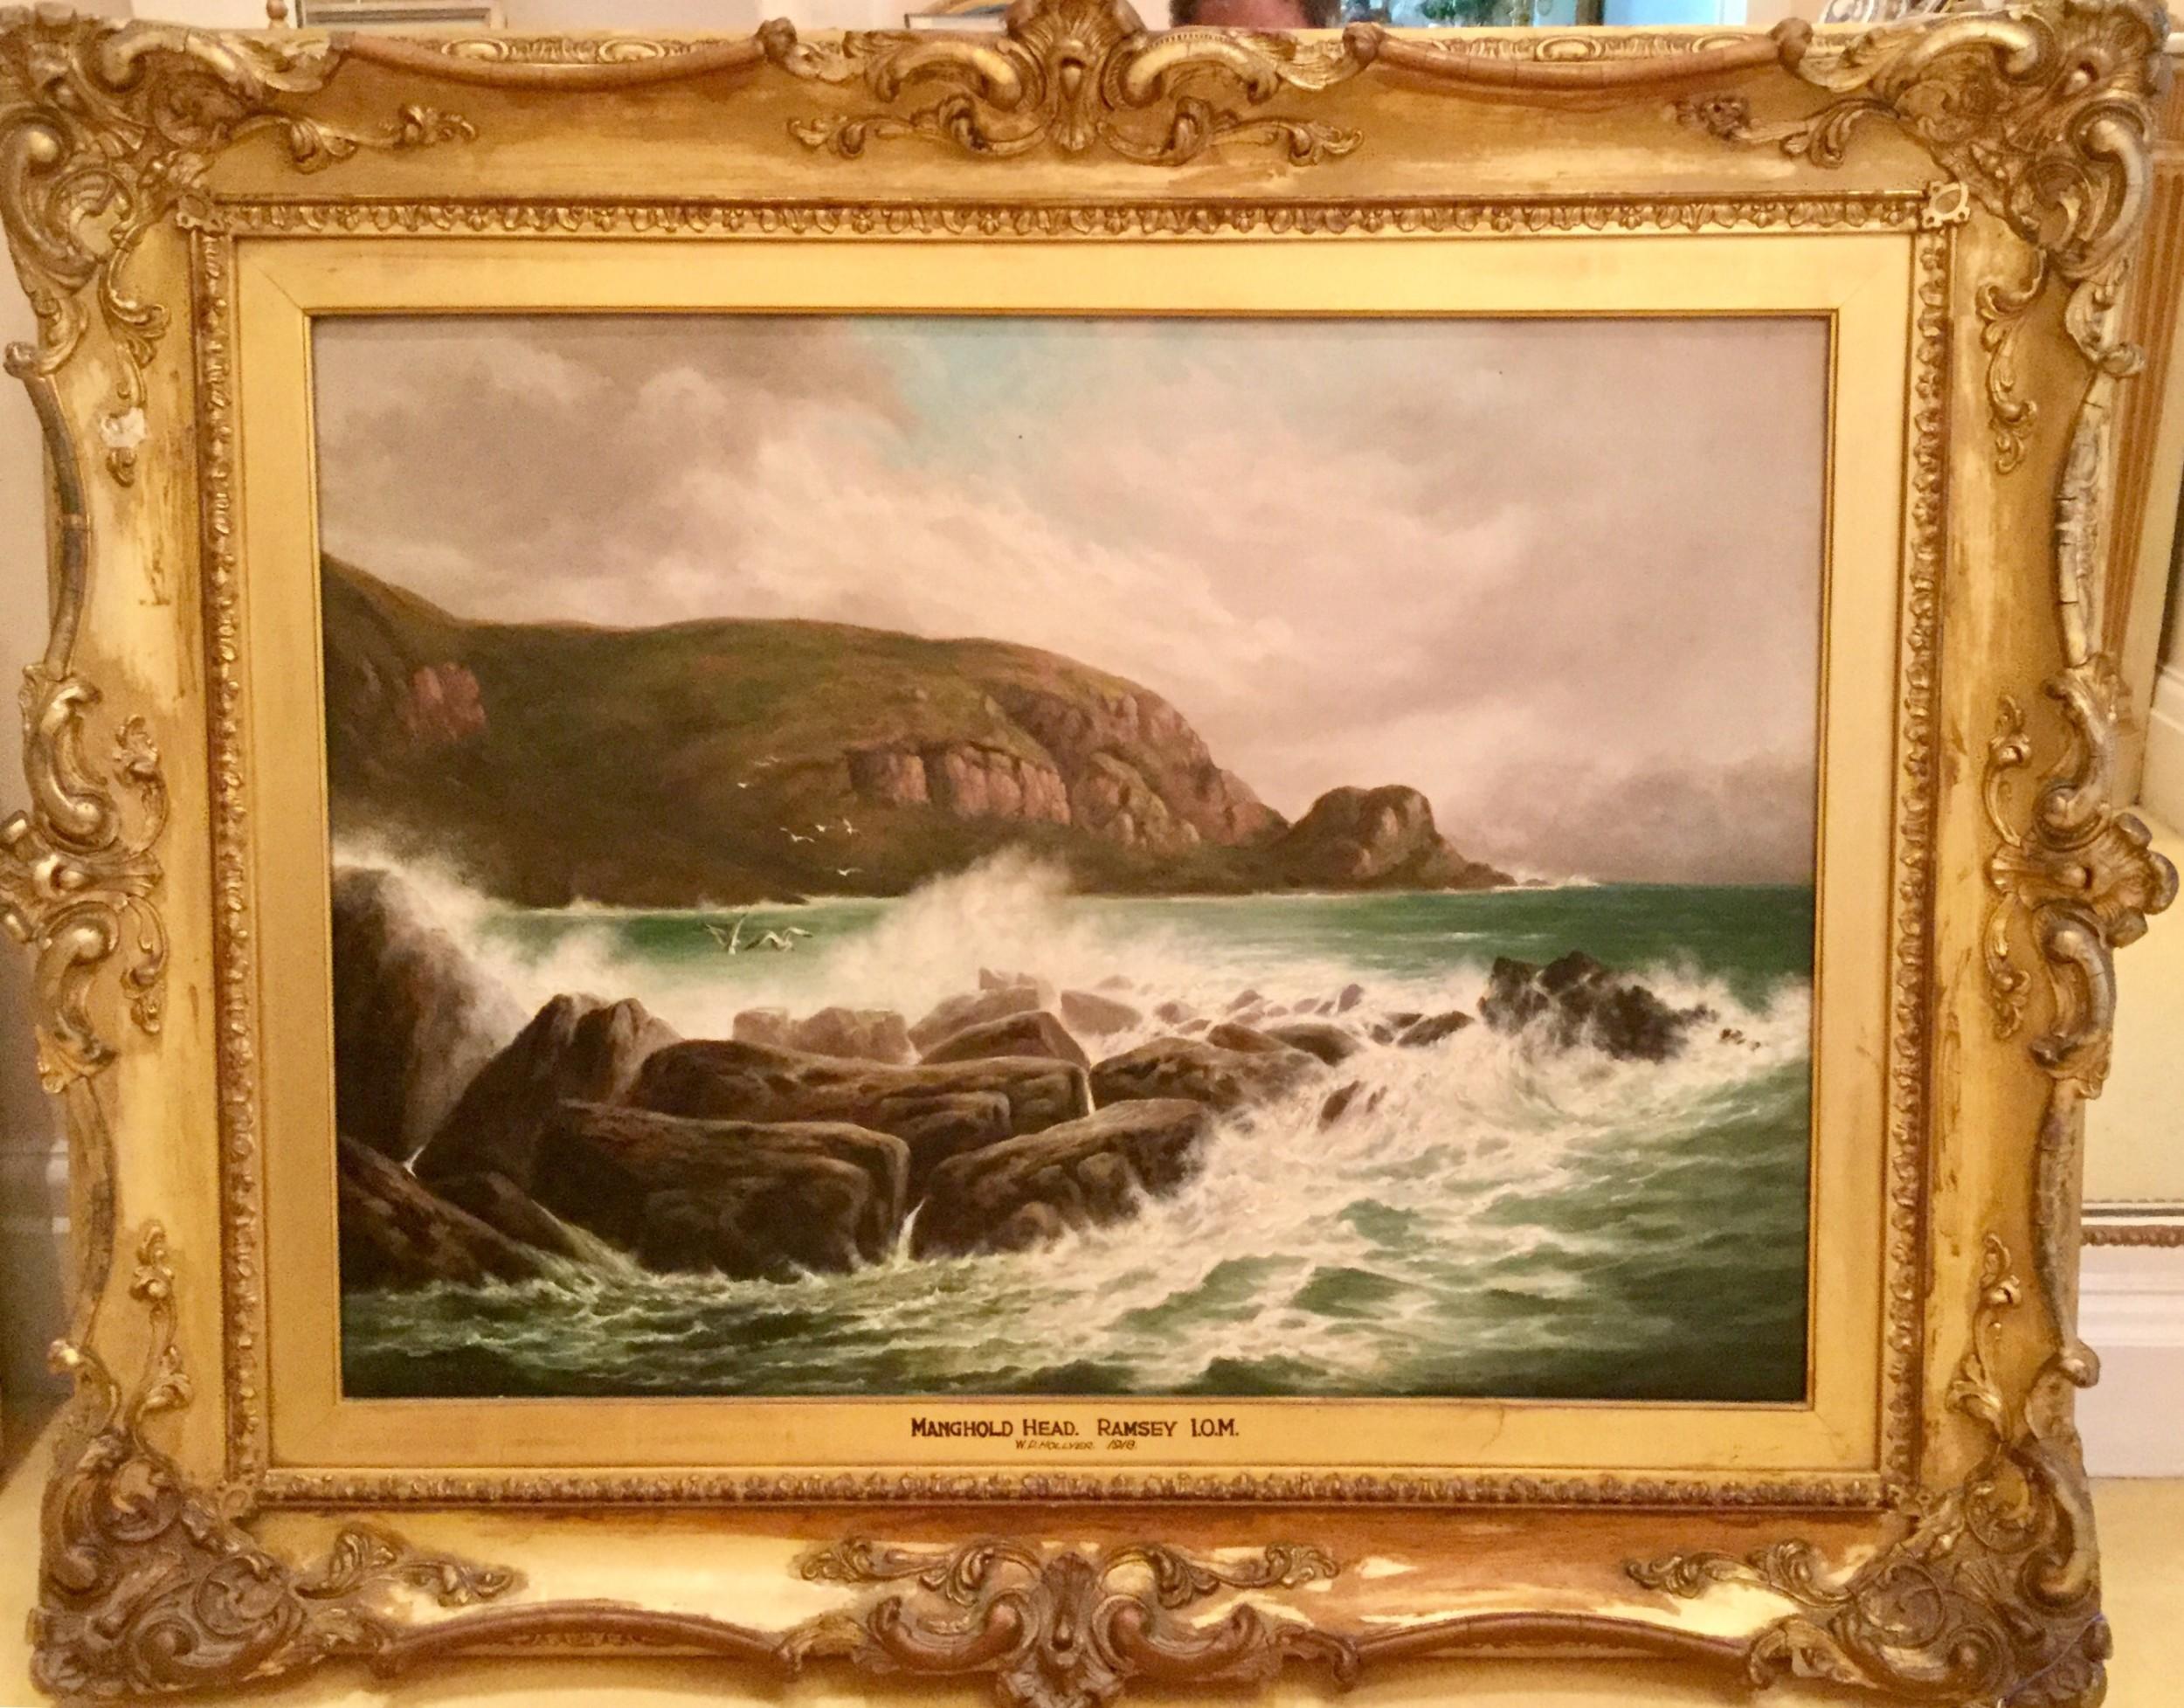 william perring hollyer oil painting ' manghold headramsey isle of man'